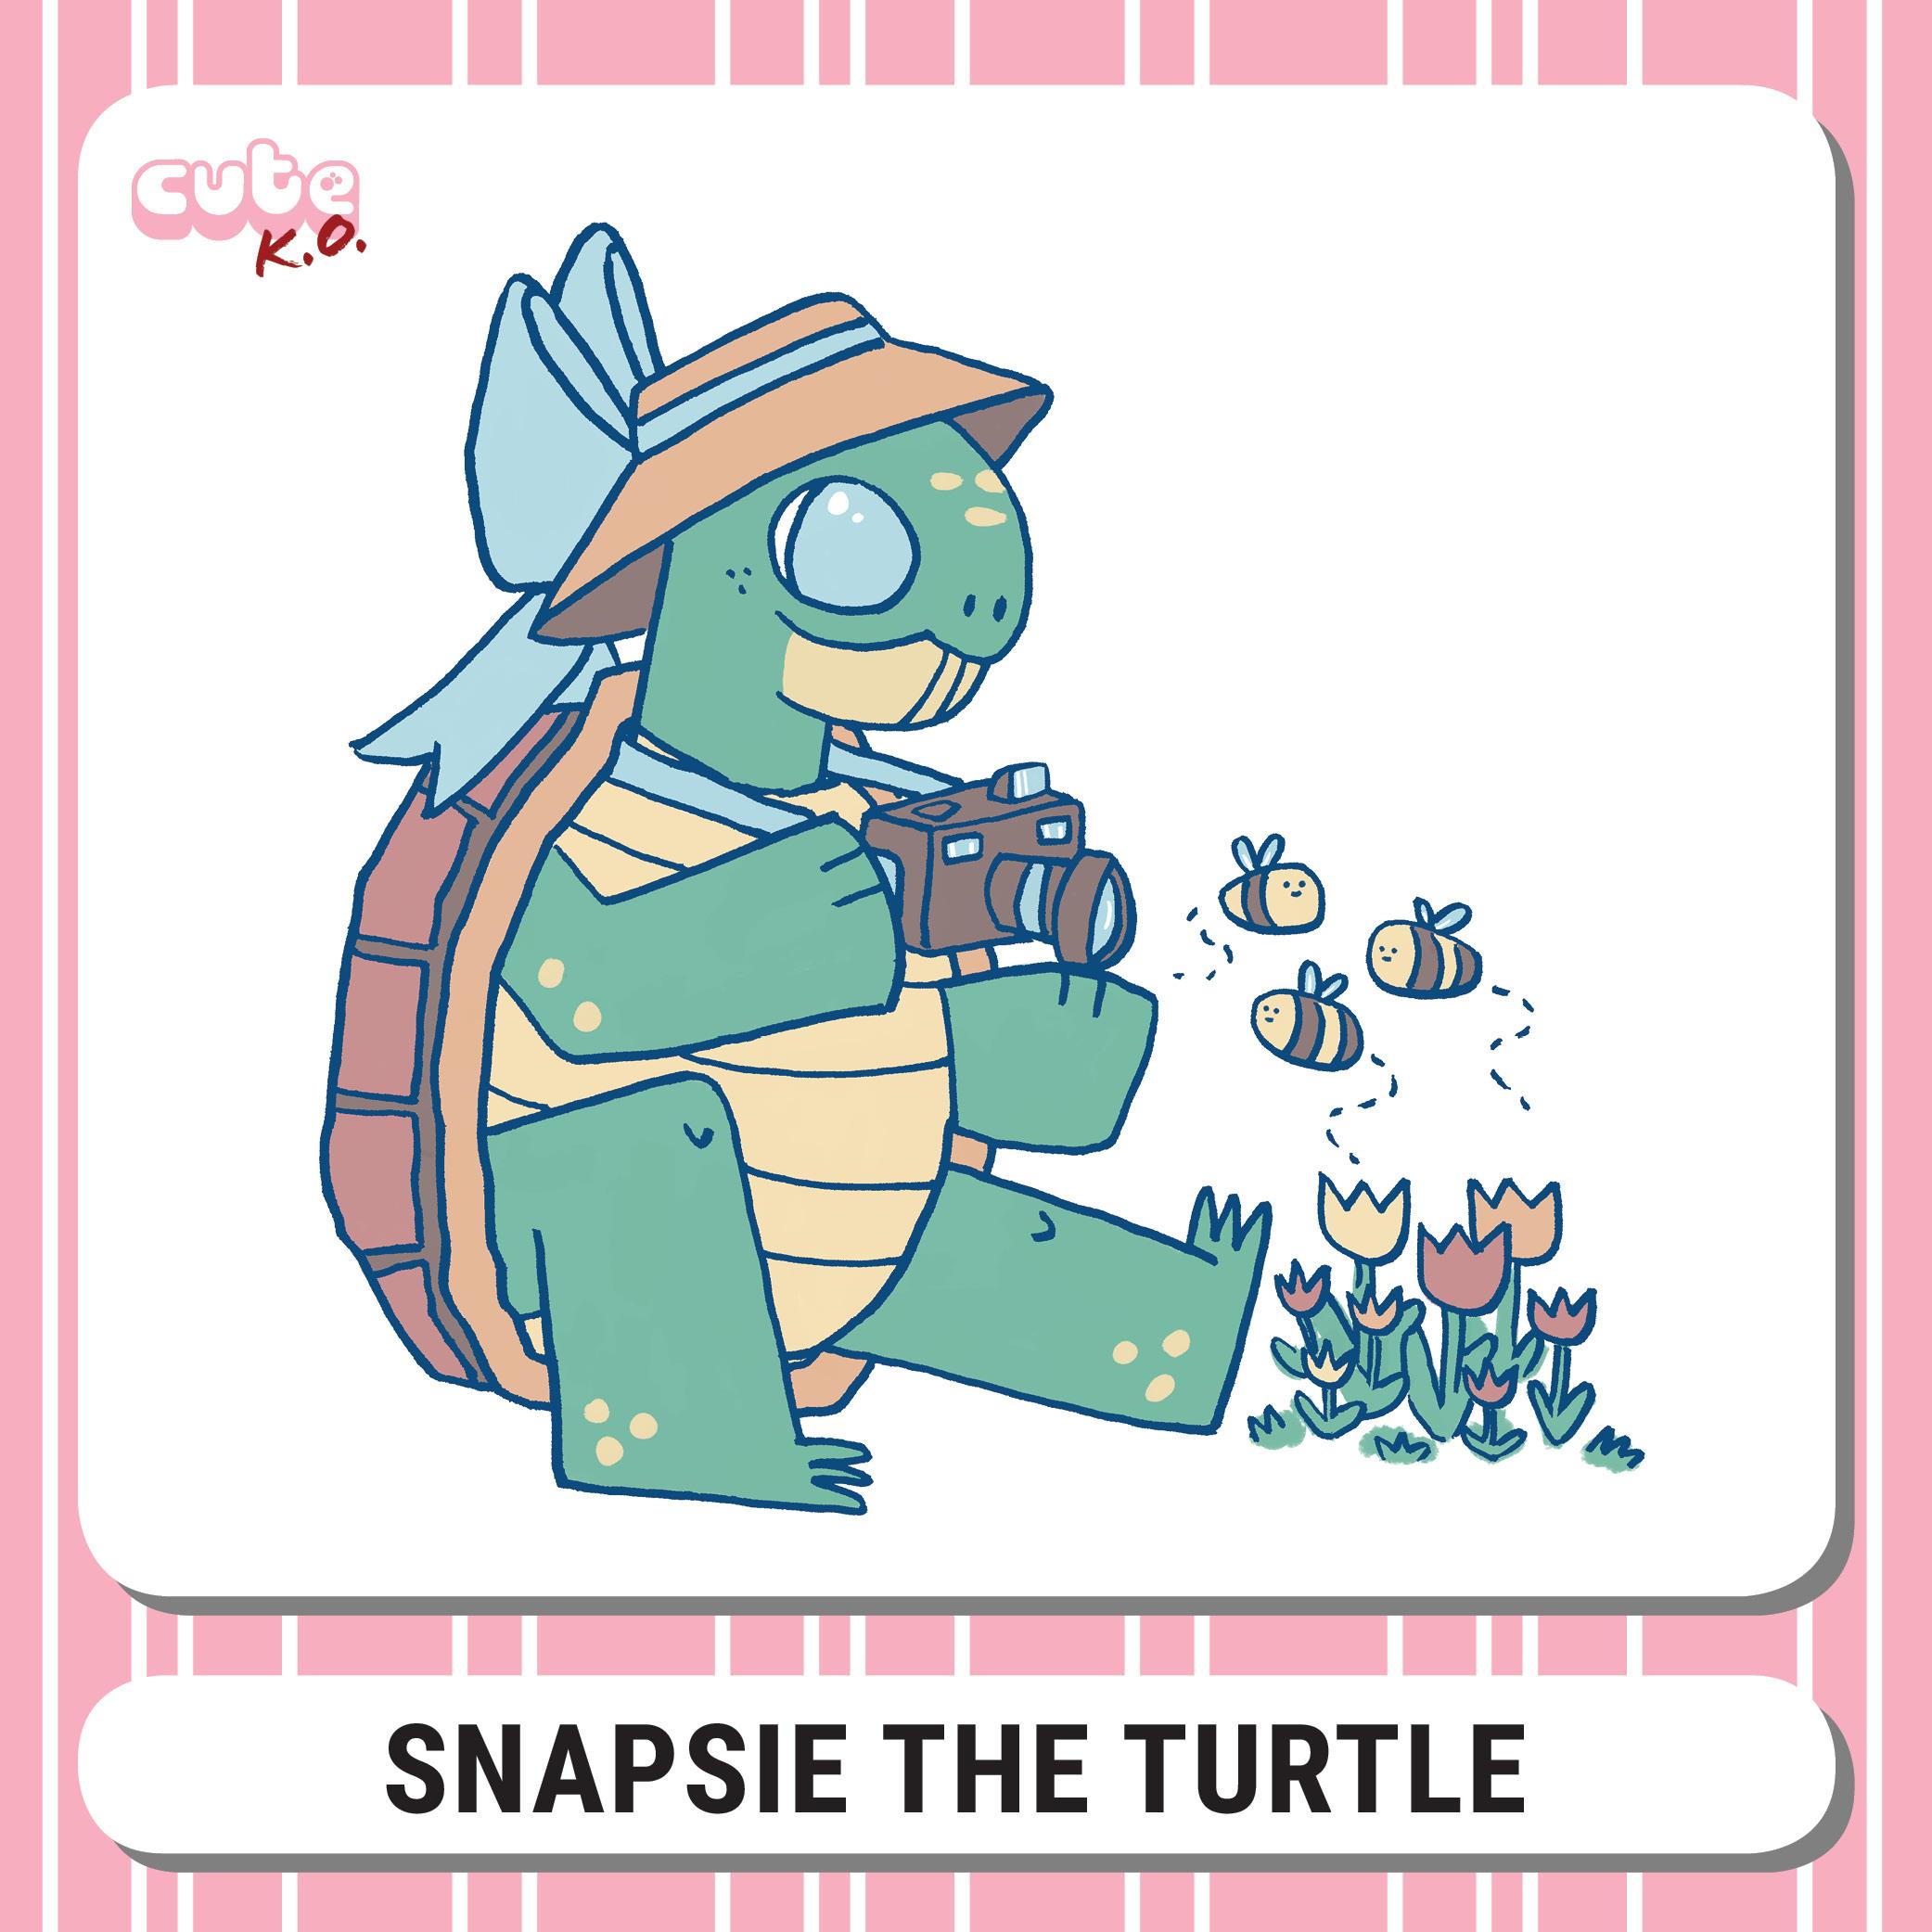 Cute K.O. 2019 Round Four: Snapsie the Turtle